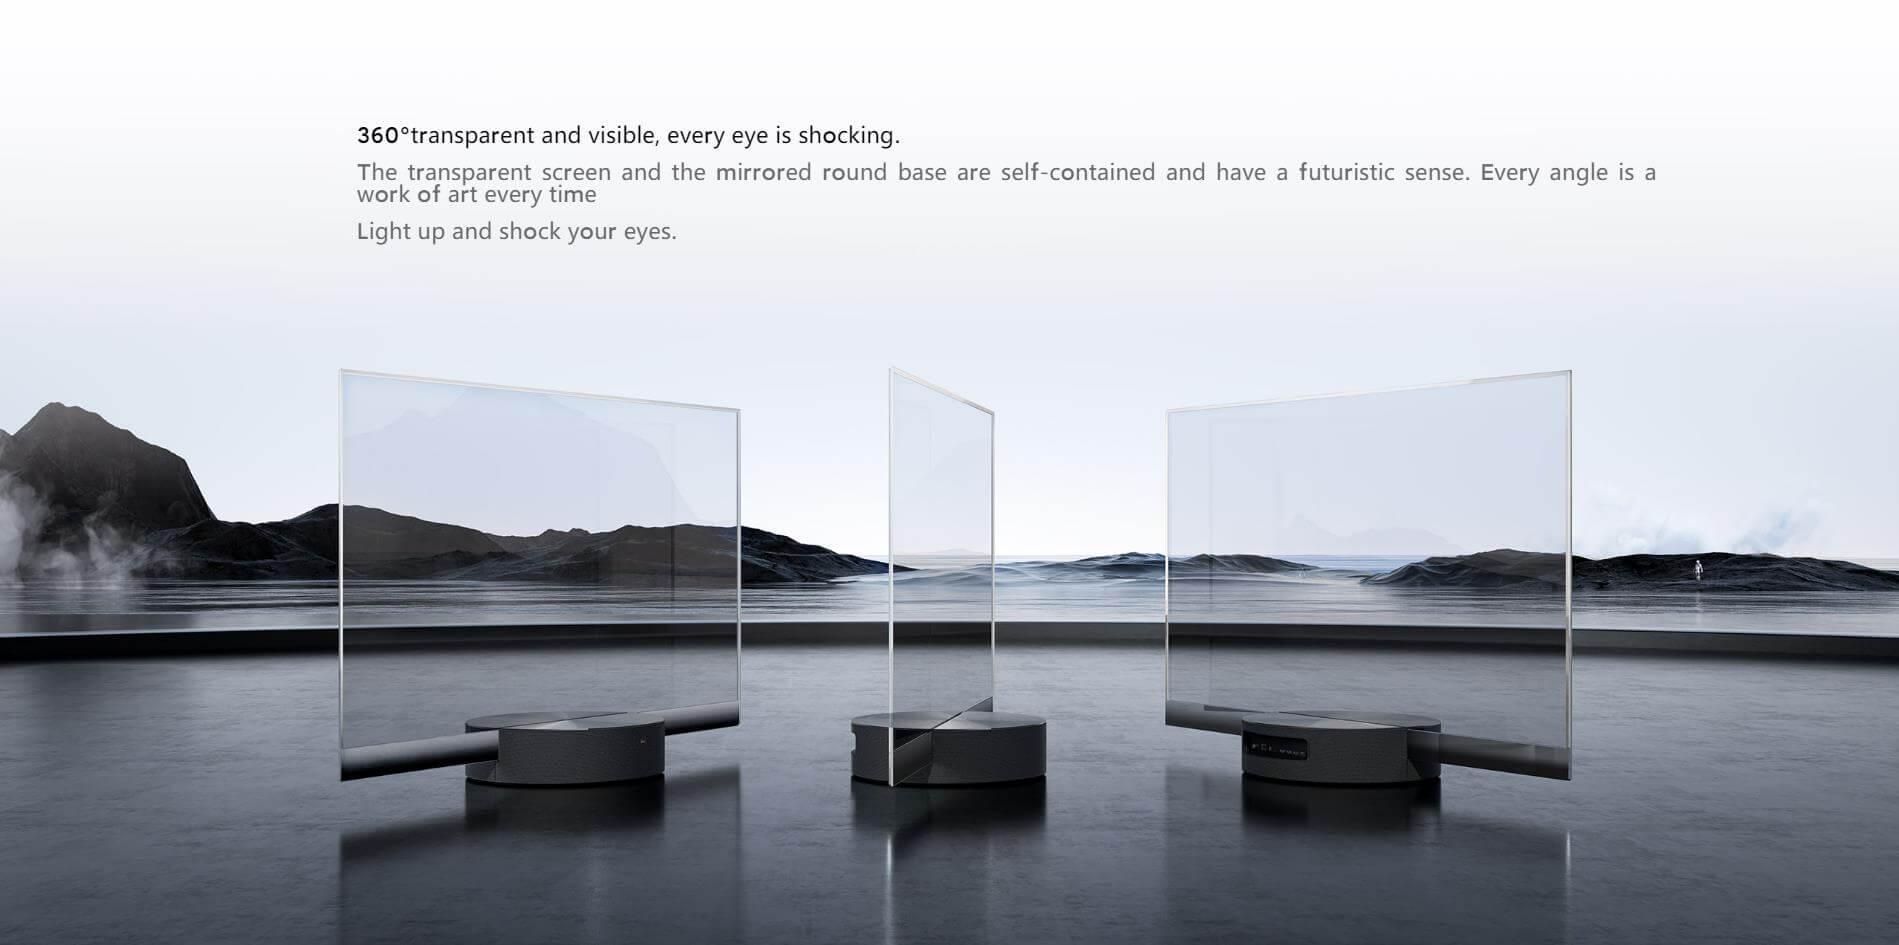 Mi Tv Lux Transparent Edition (1)